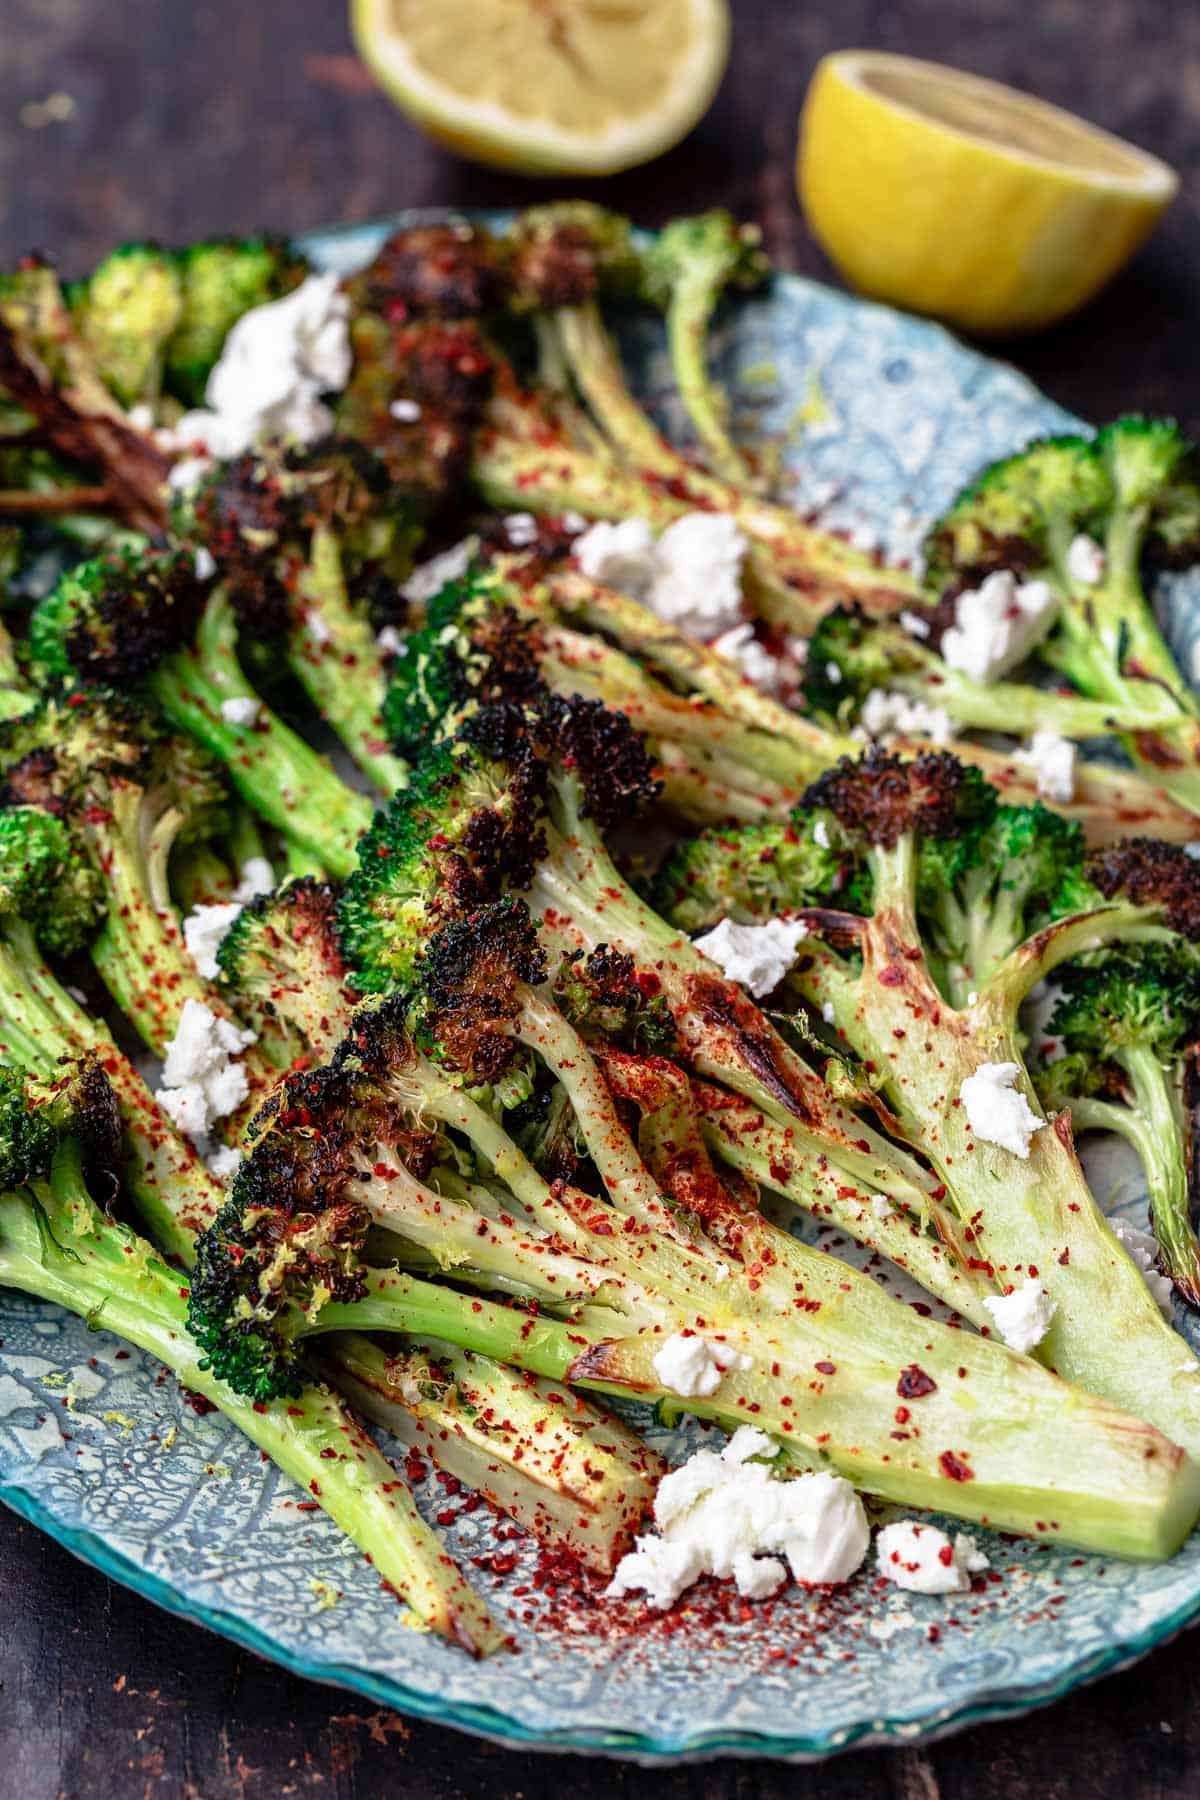 Broccoli: Oven Roasted Broccoli With Lemon   The Mediterranean Dish